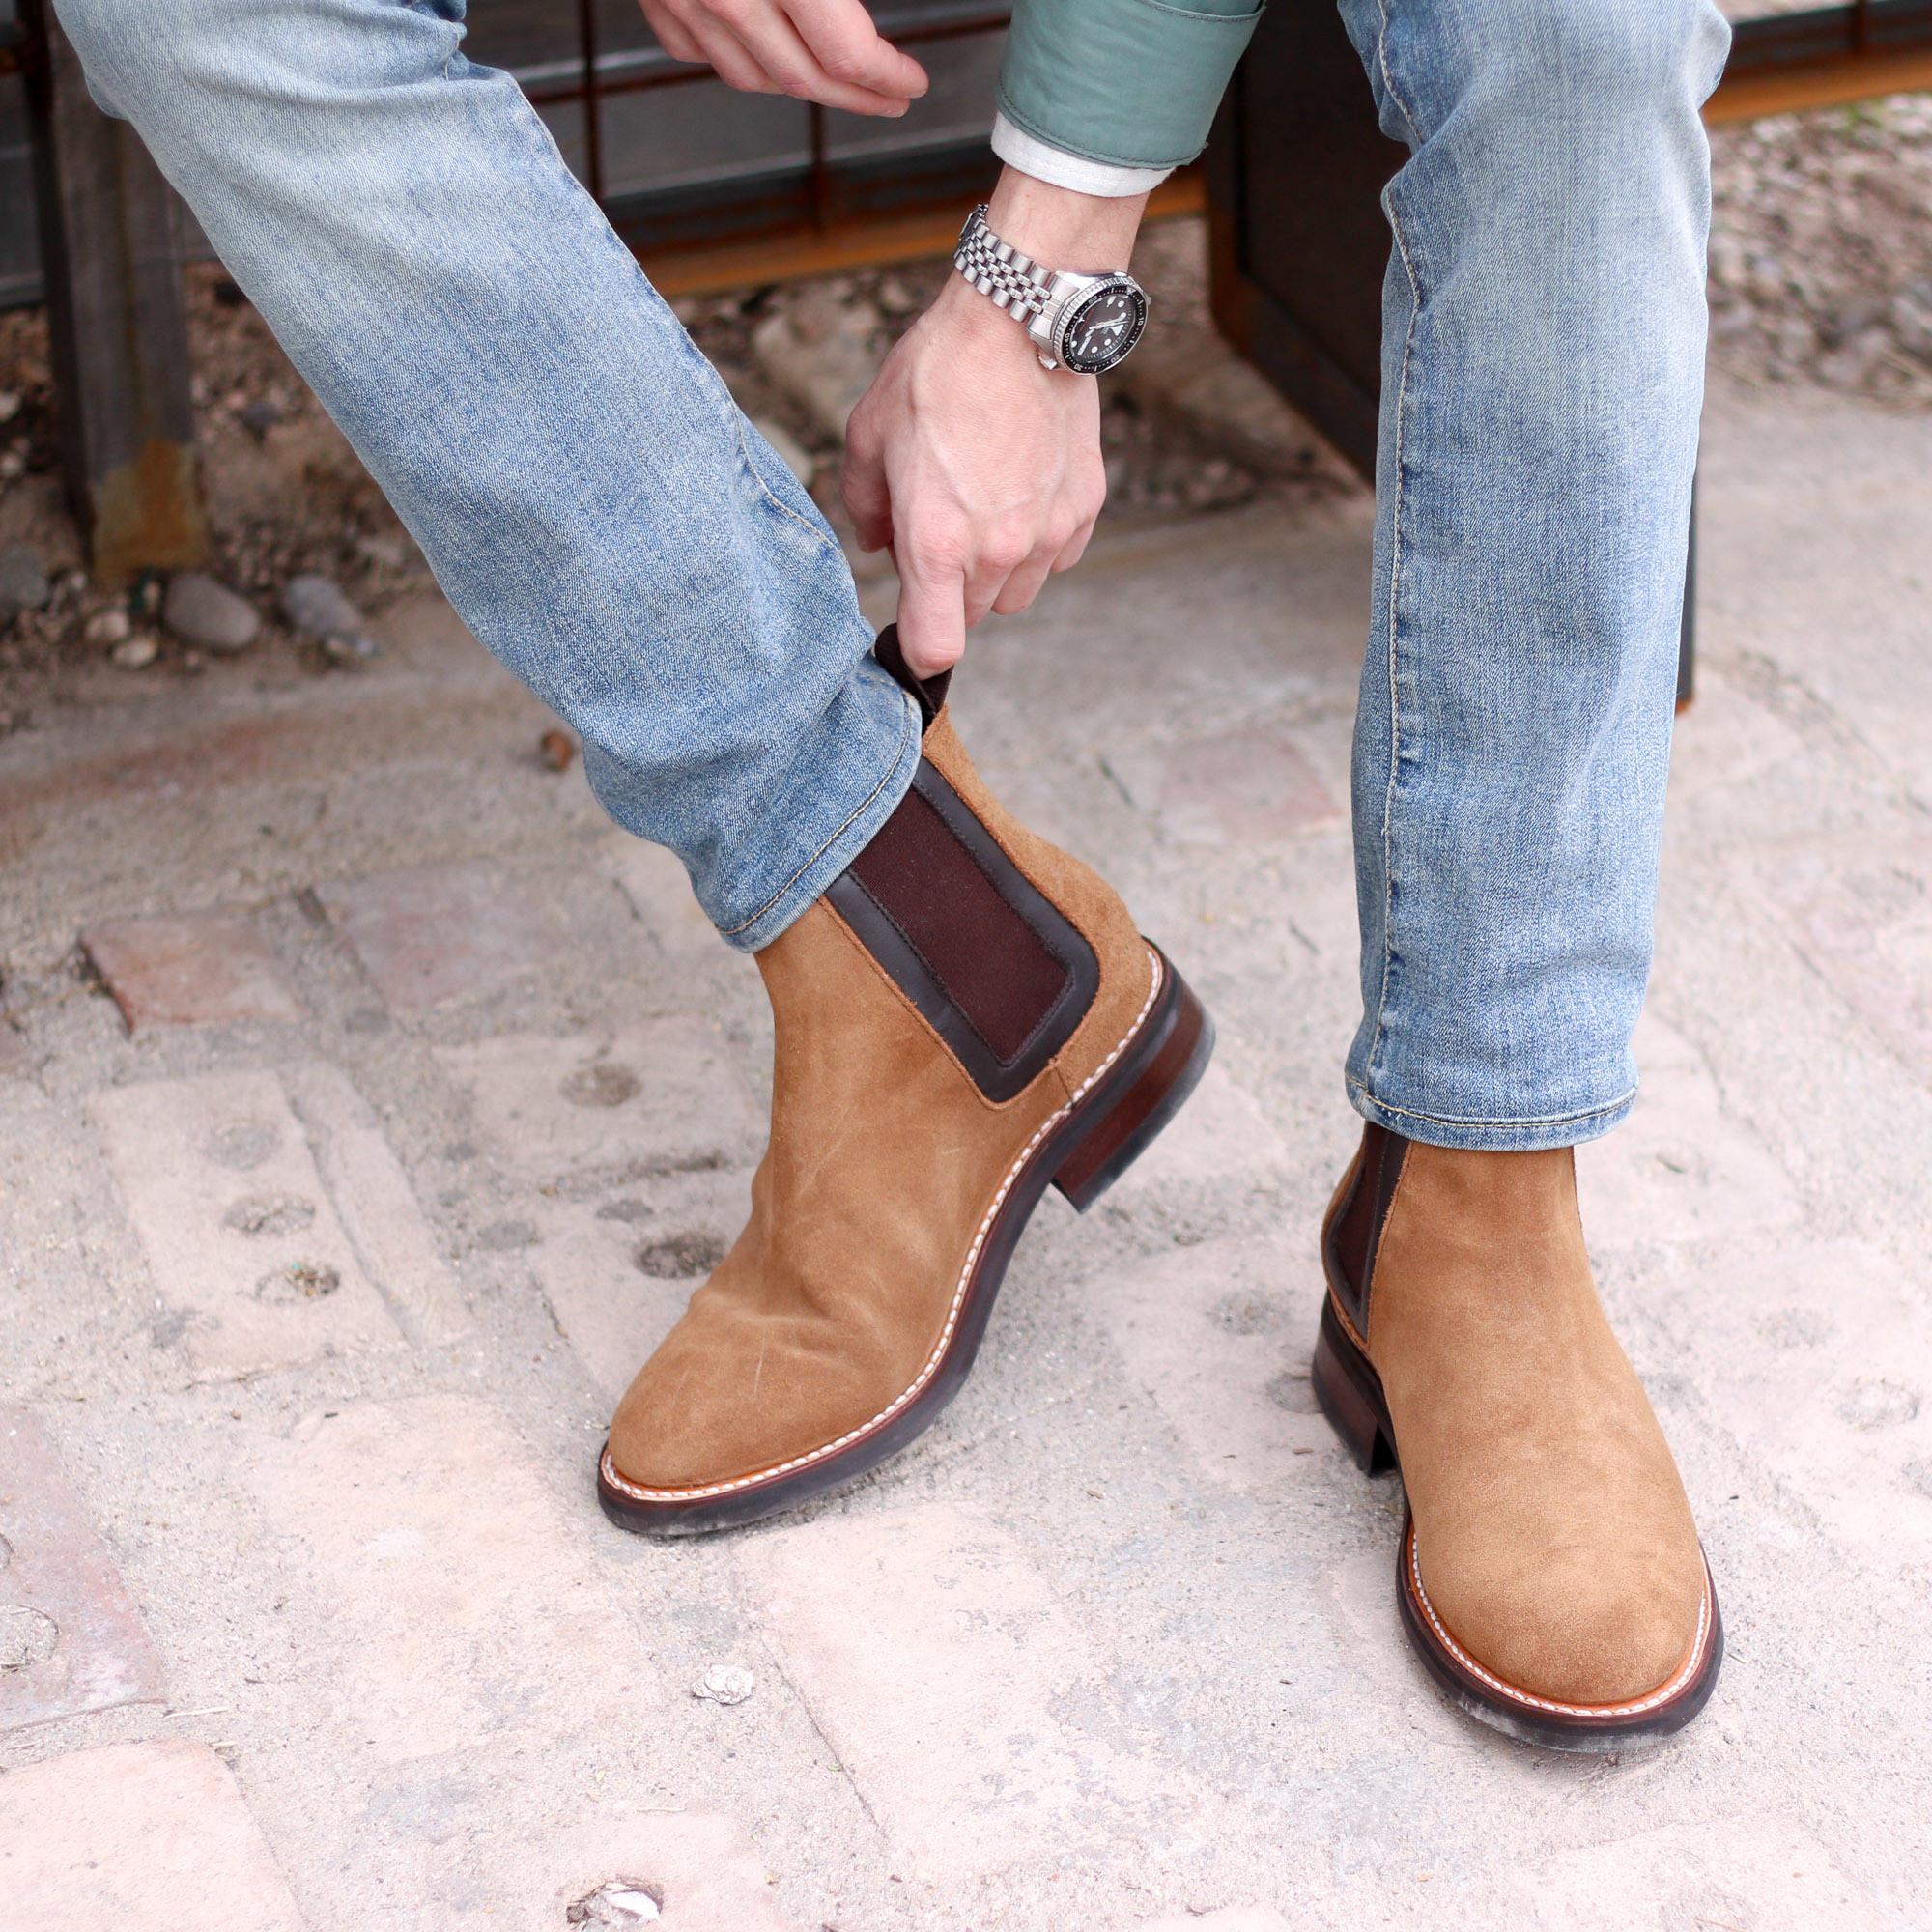 3a52fe8f45 Chelsea Boots for Short Men?